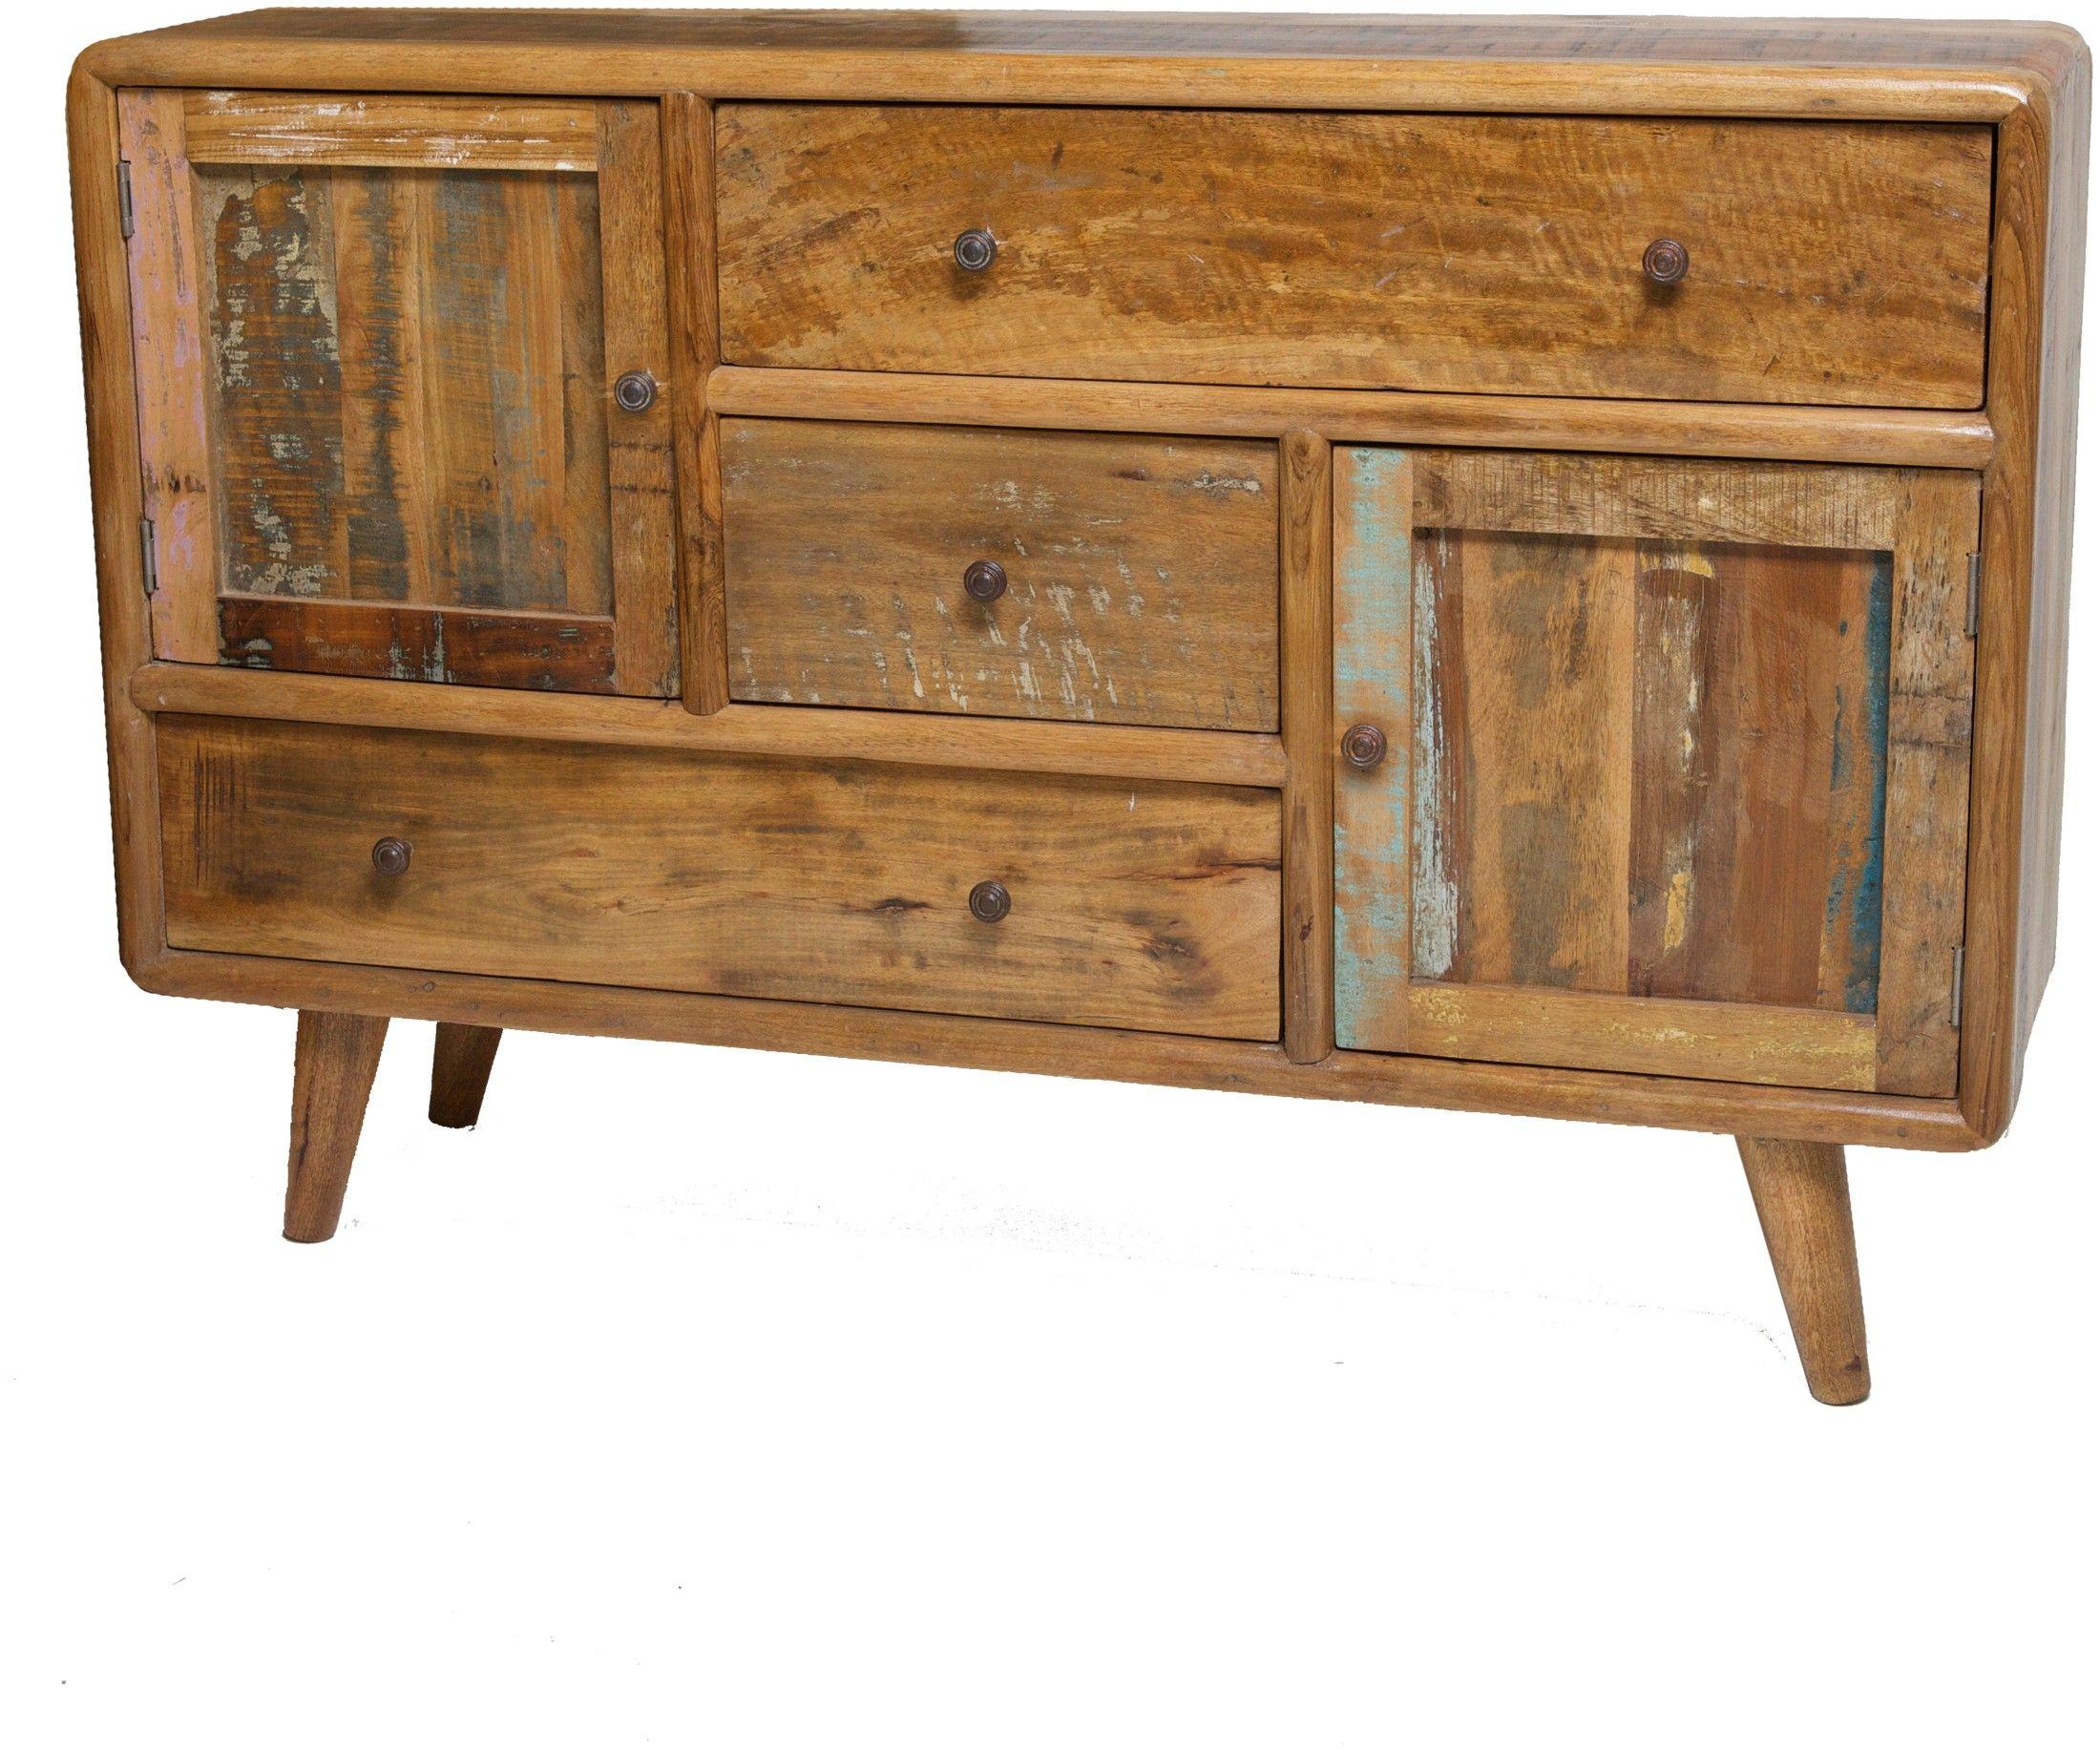 Retro Slaapkamer Meubels : Retro vintage dressoir eleonora slaapkamer peggy pinterest